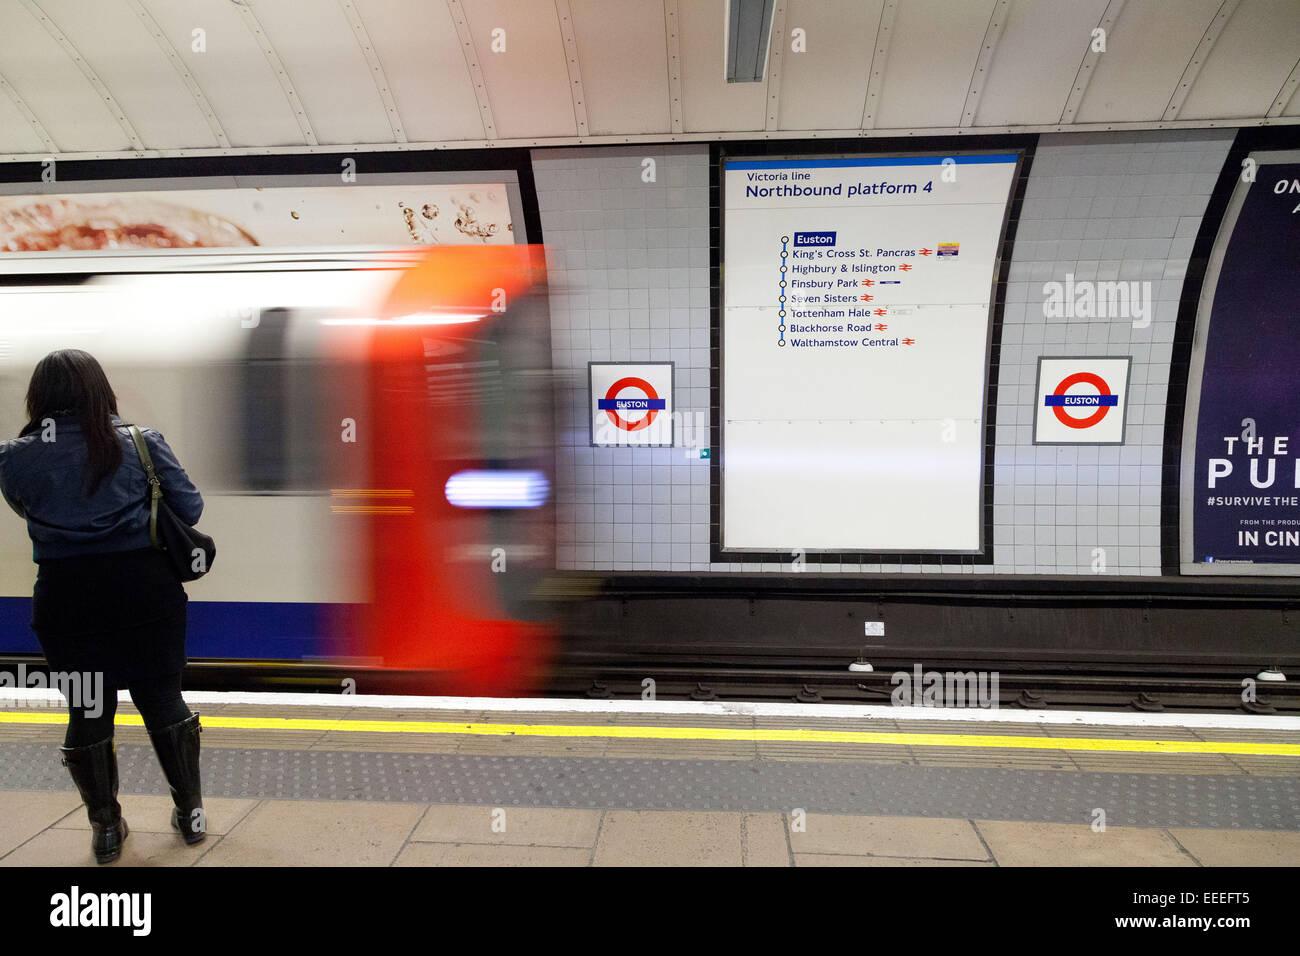 Victoria line train arriving into Euston - Stock Image